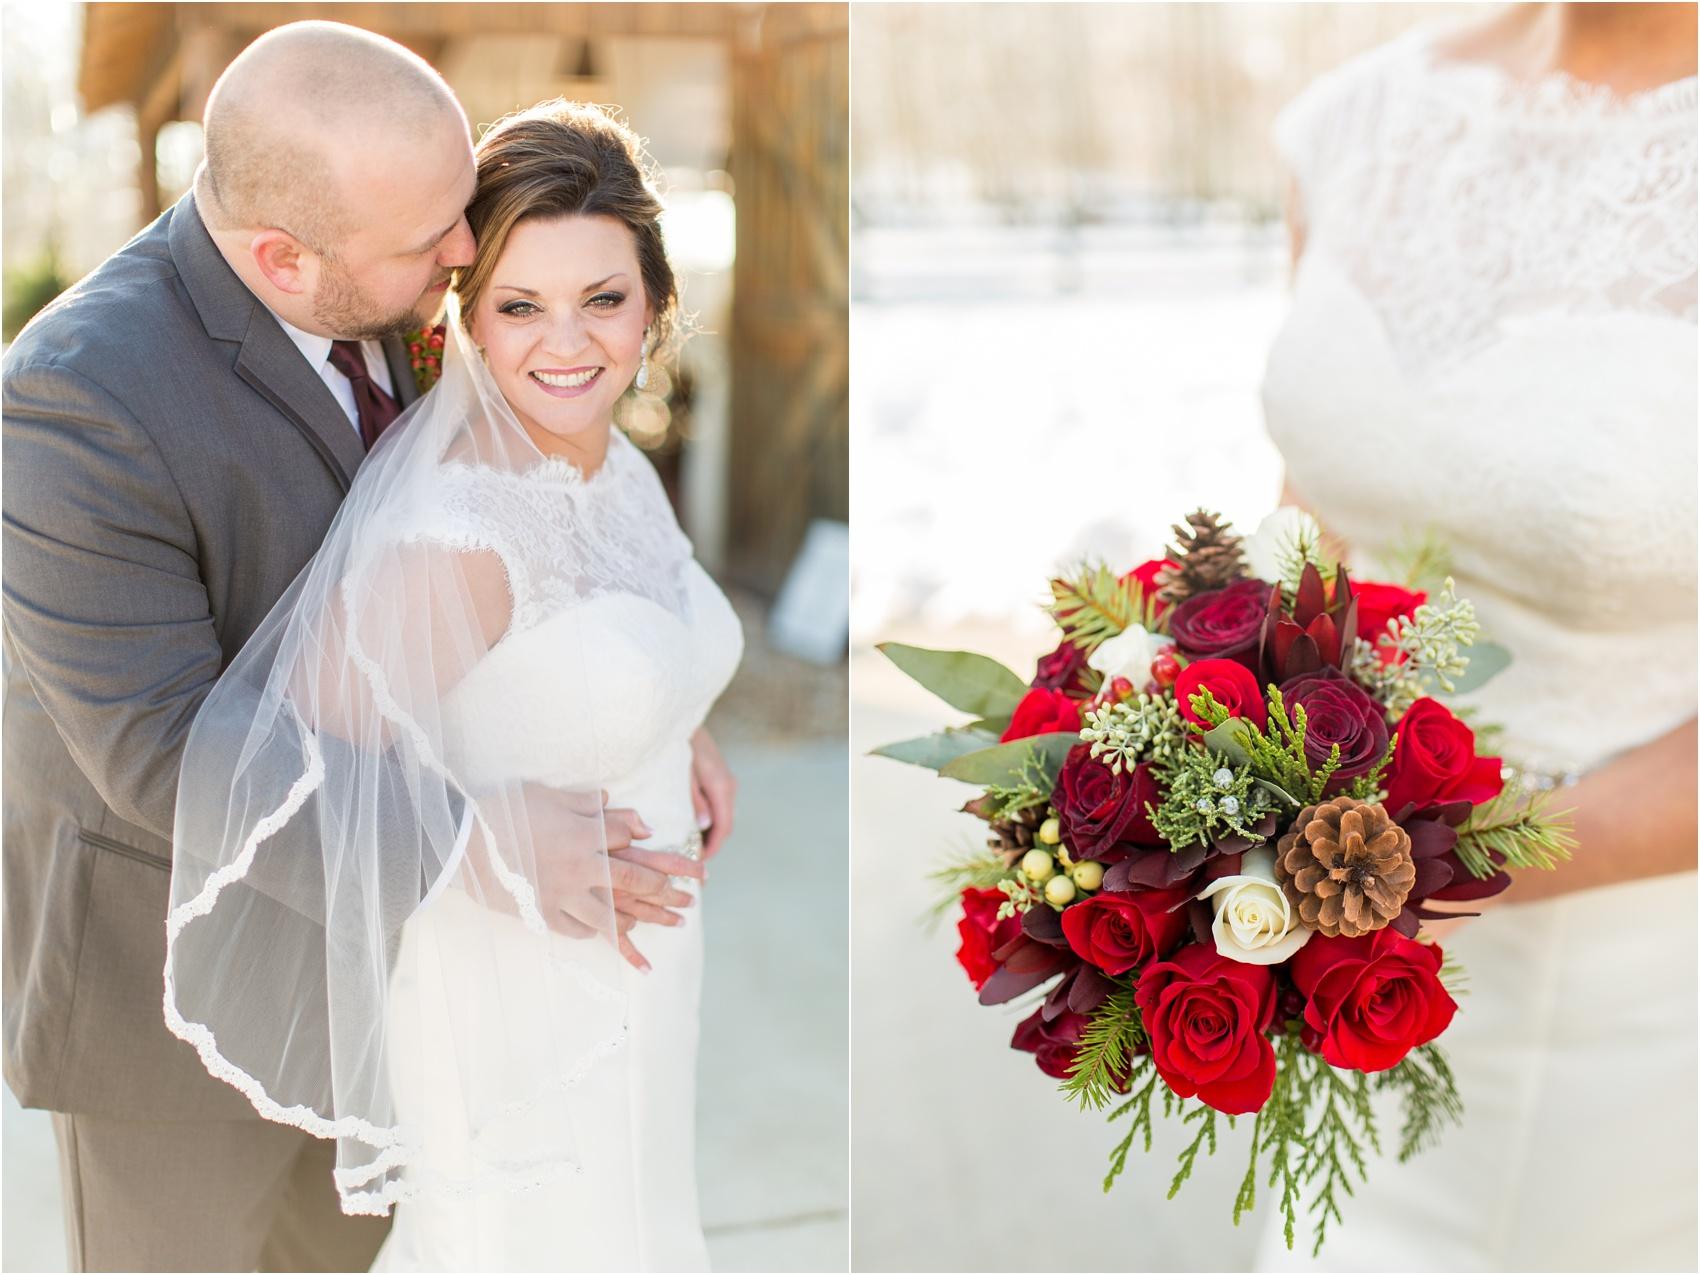 Savannah Eve Photography- Page Wedding Blog-44.jpg